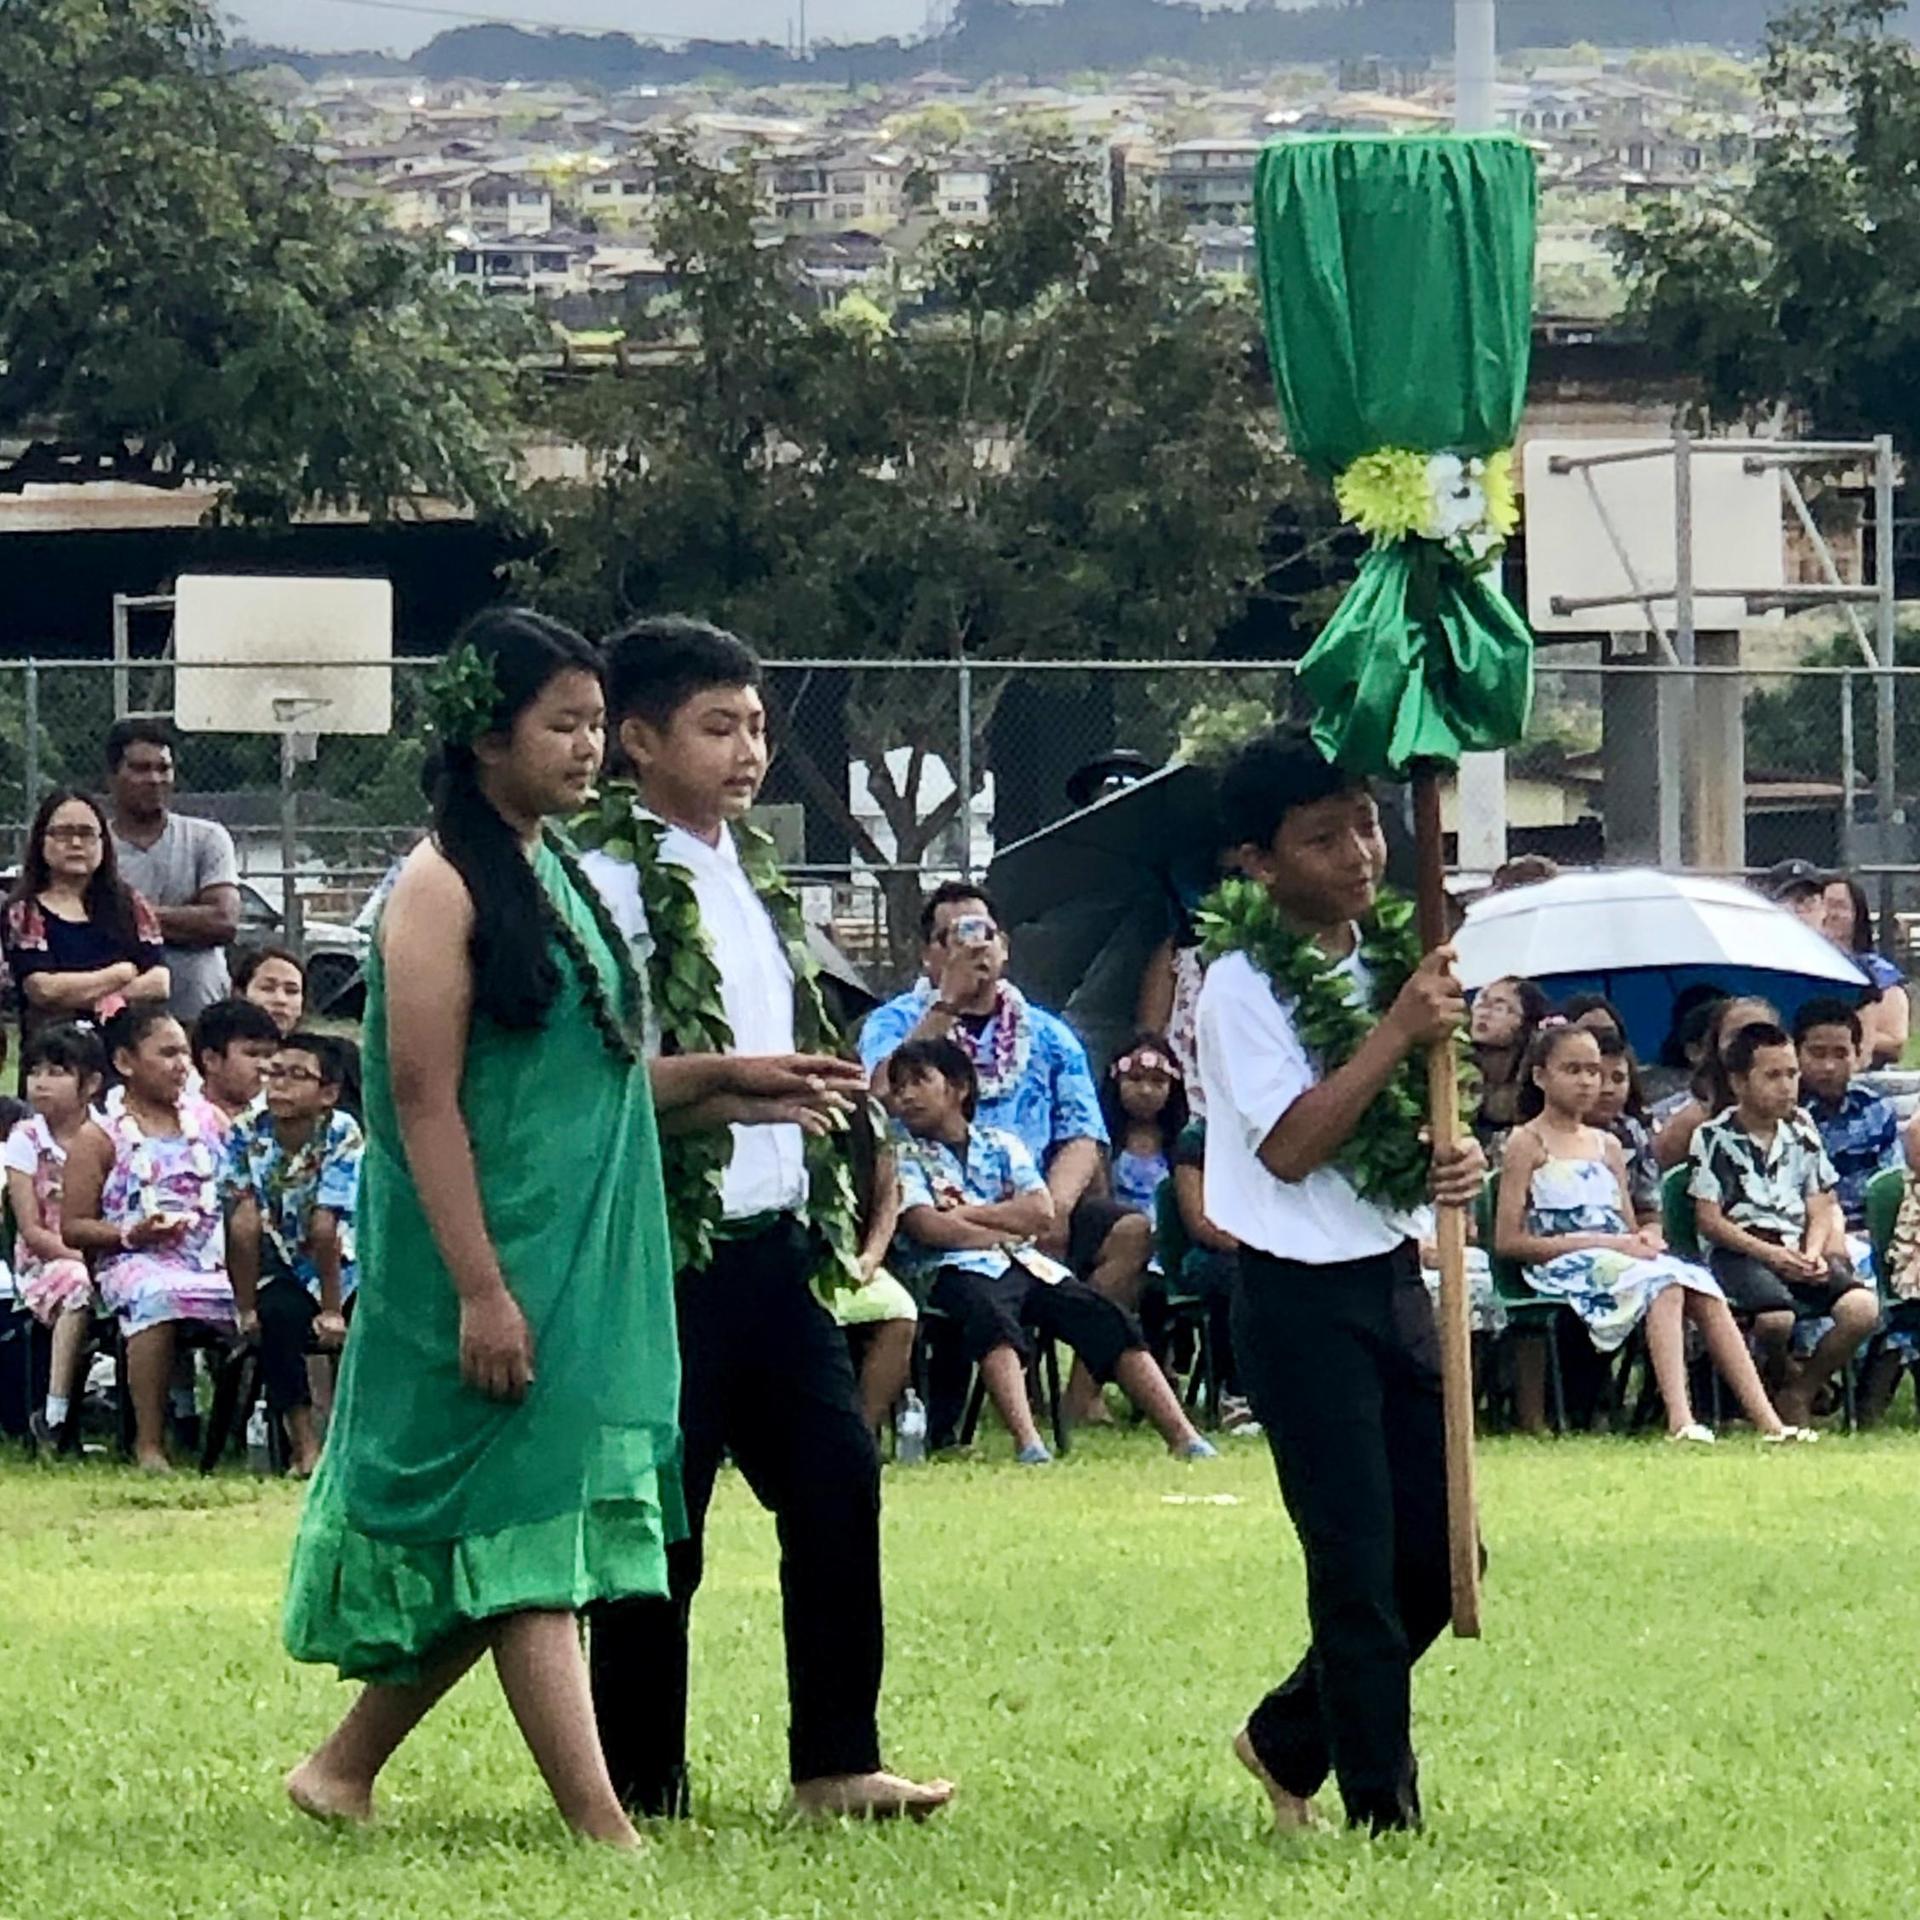 Molokai island princess and escort